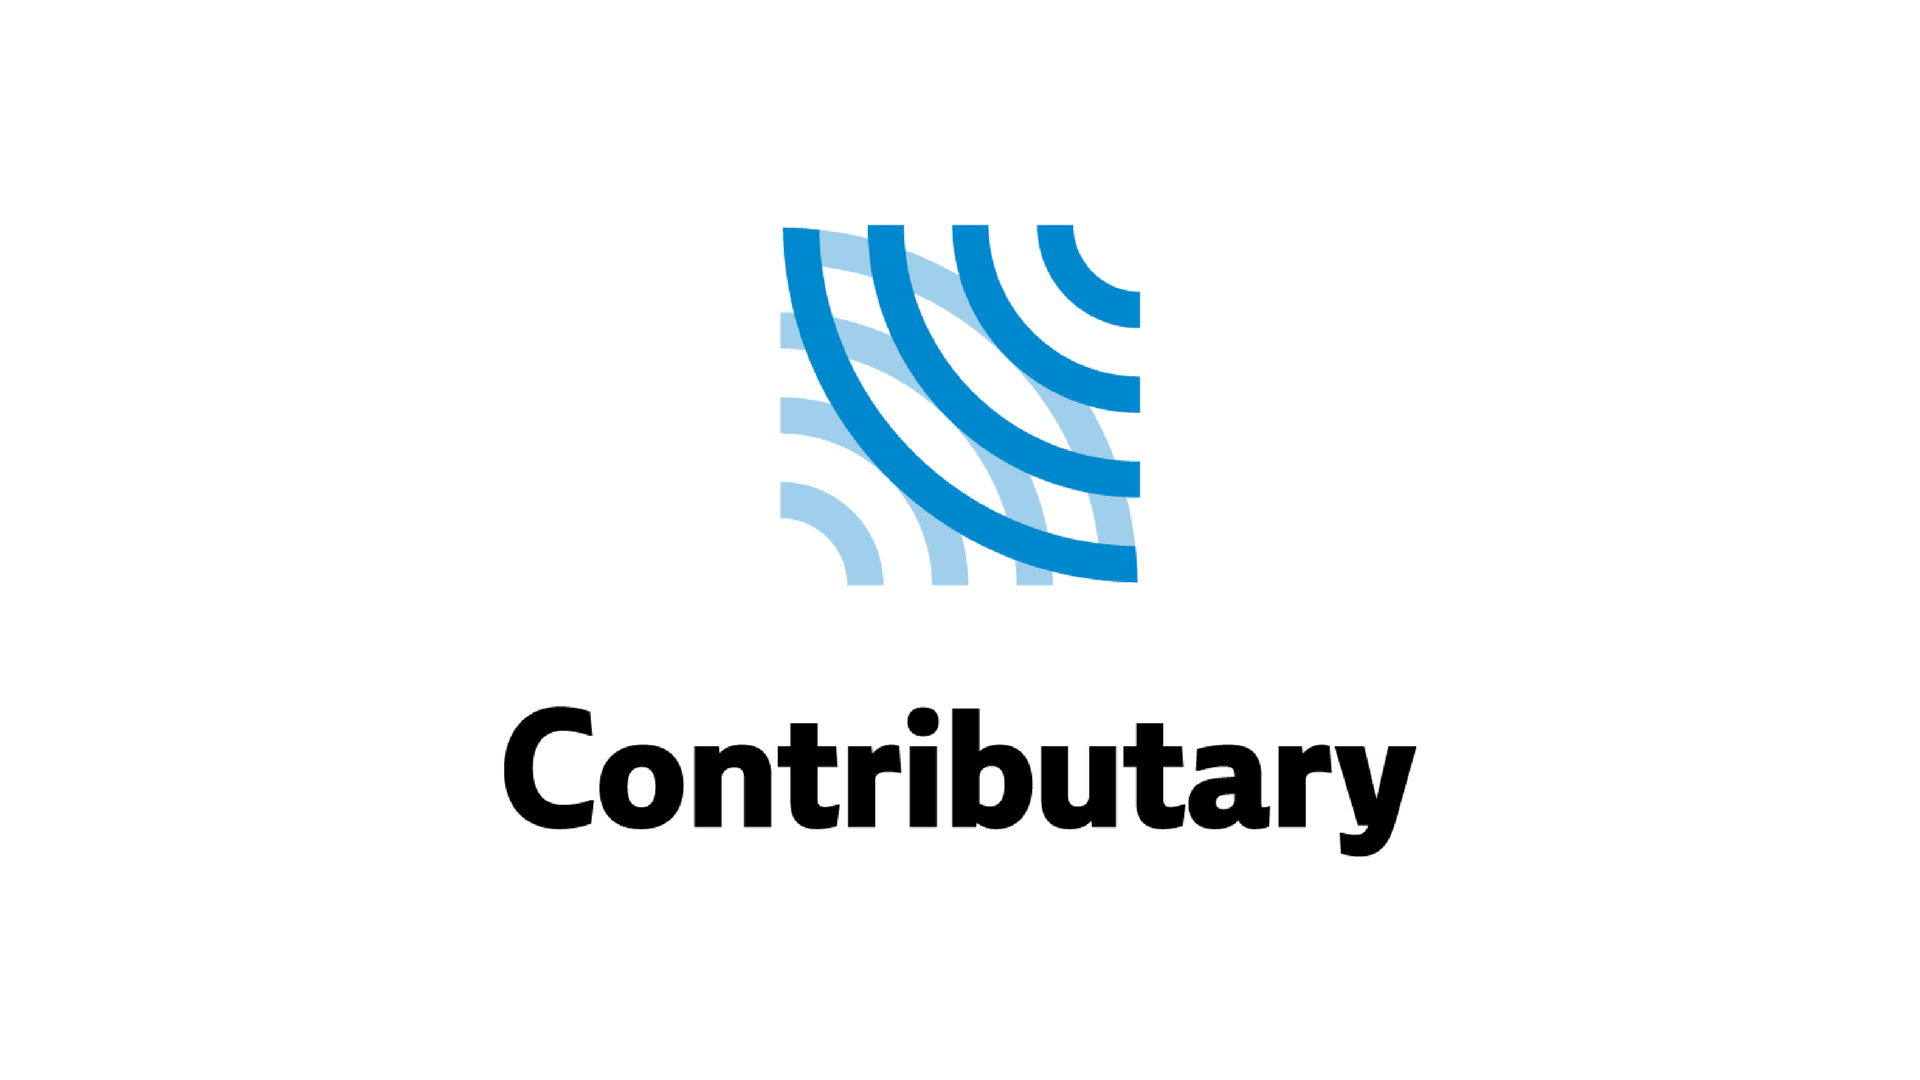 Messaging Development and Copywriting -